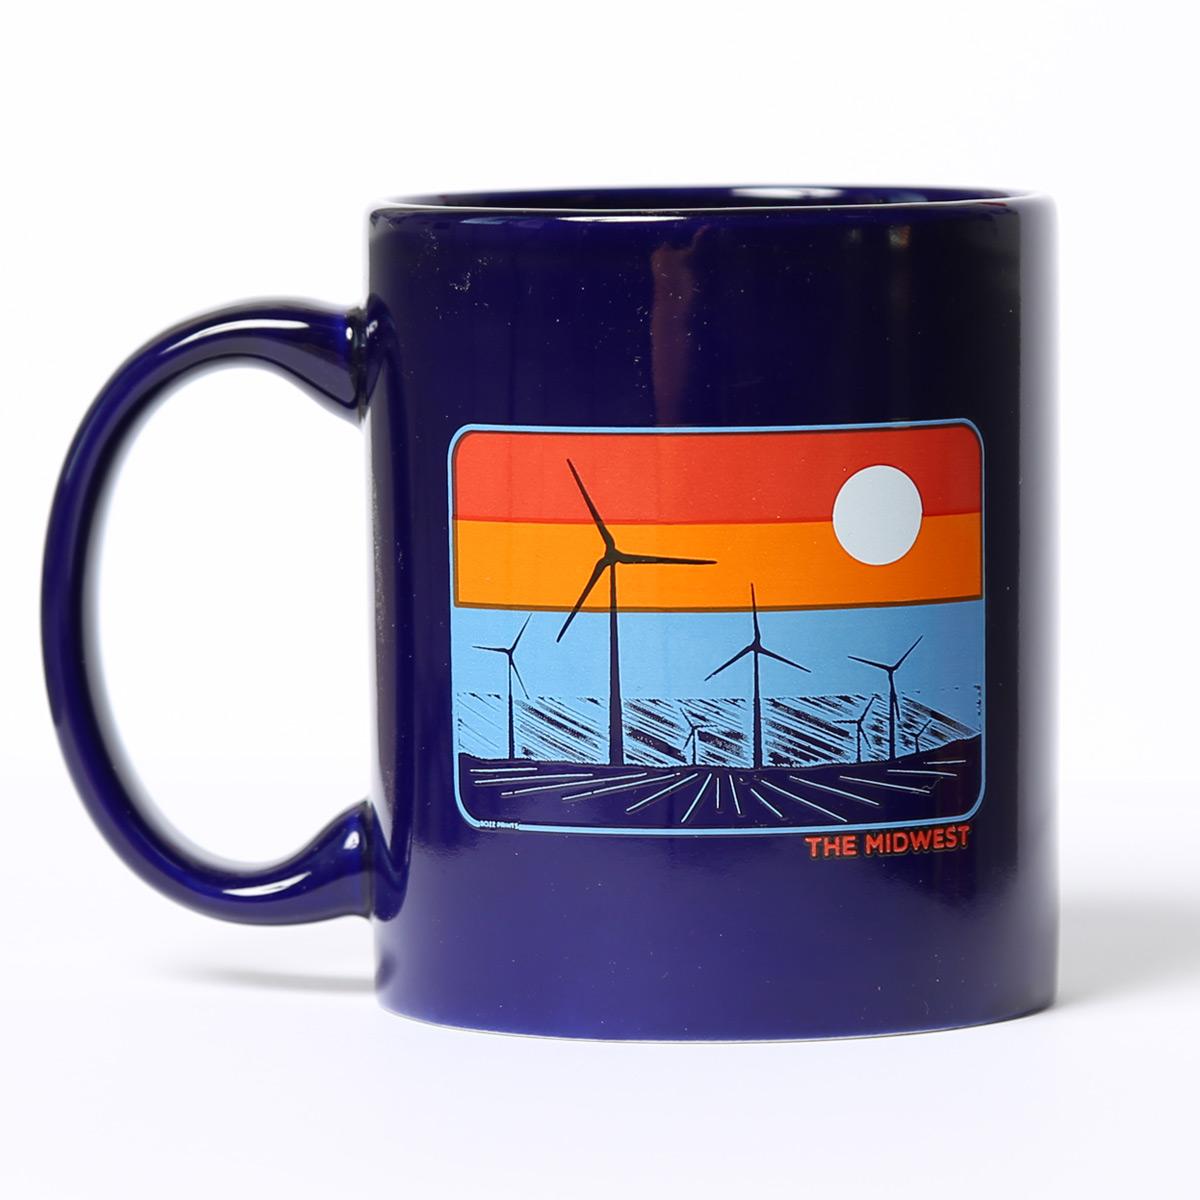 the-midwest-mug.jpg